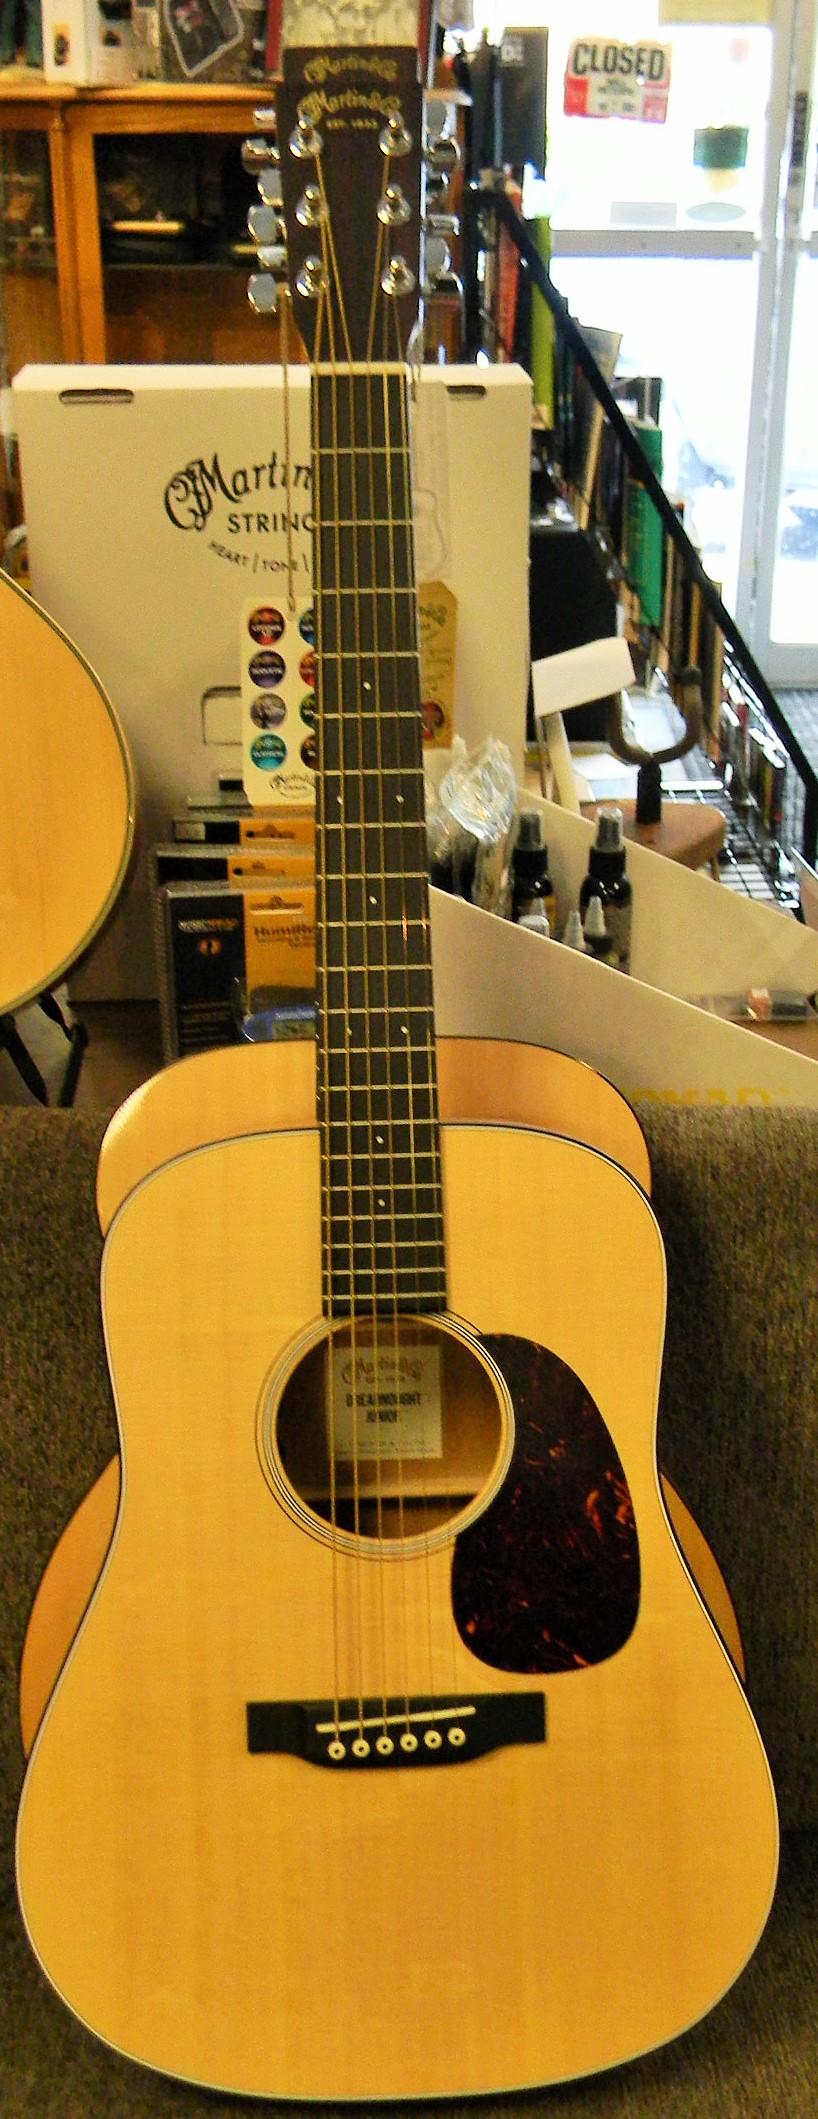 dscn0943 san antonio guitar store guitar tex. Black Bedroom Furniture Sets. Home Design Ideas